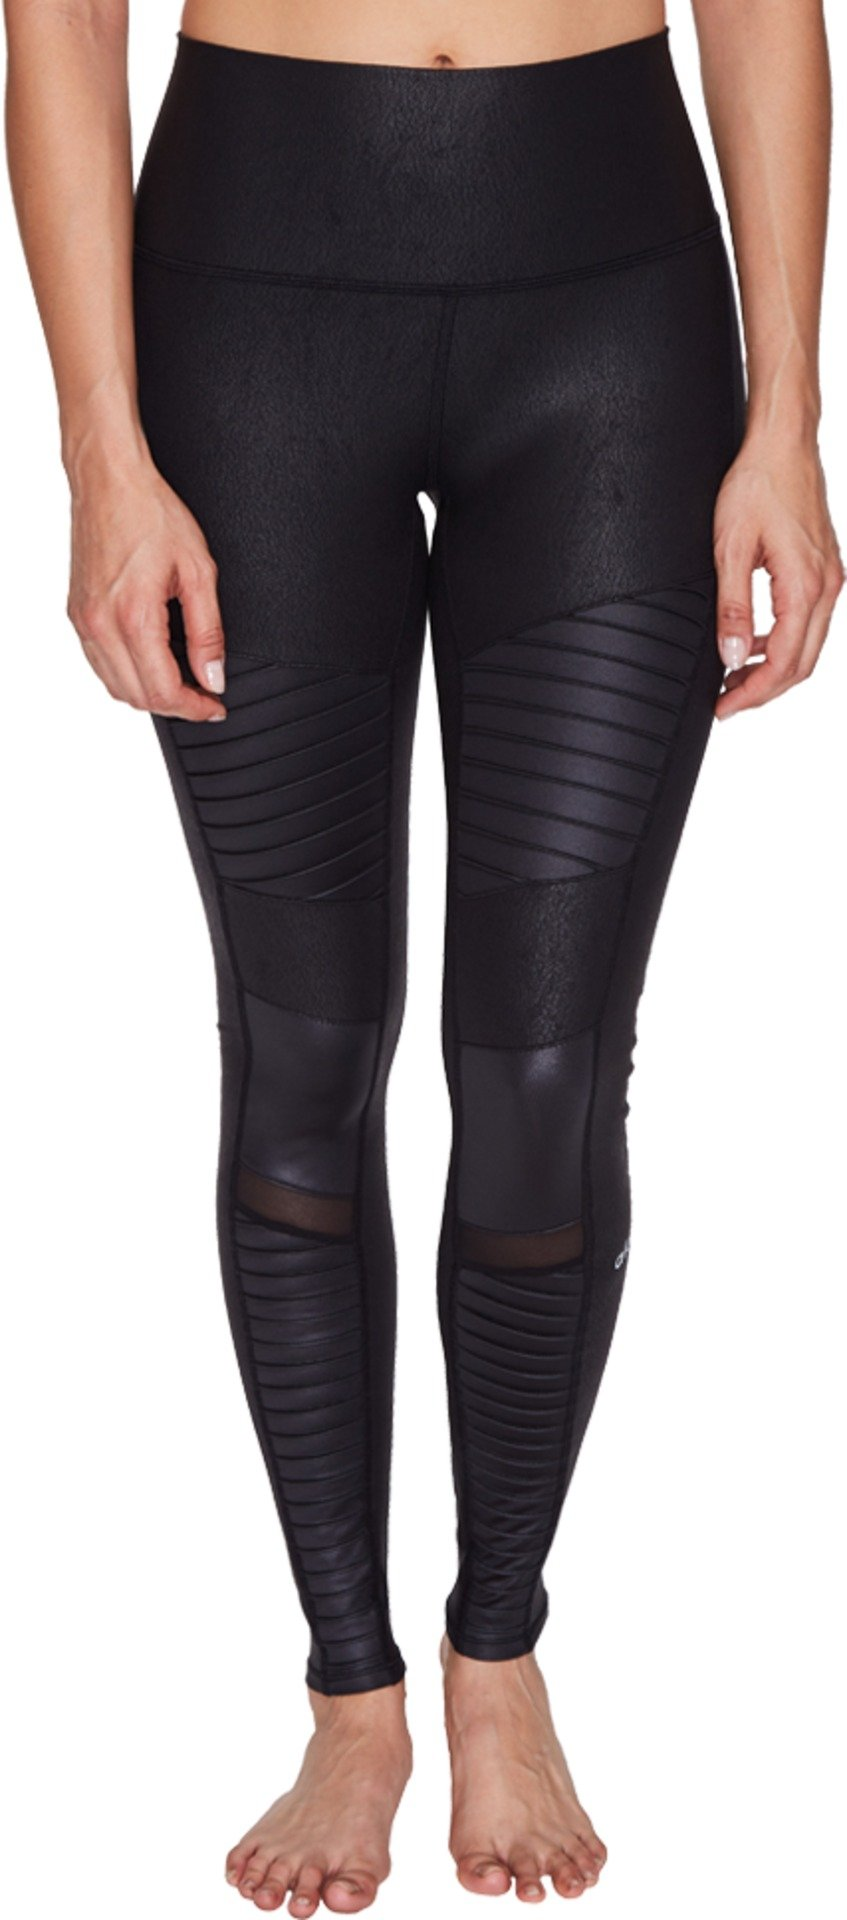 ALO Women's High-Waist Moto Leggings Black Performance Leather/Black Glossy Pants